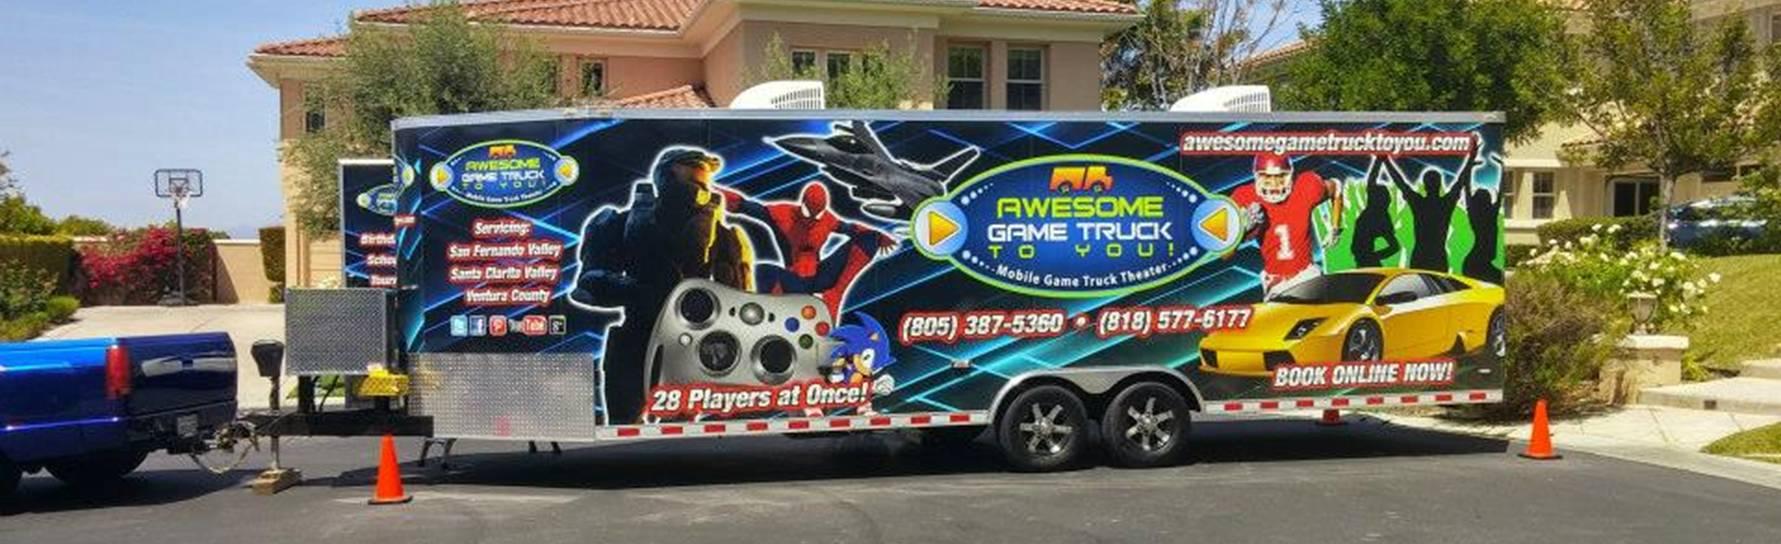 School function entertainment in San Fernando and San Clarita Valley, Ventura County, California